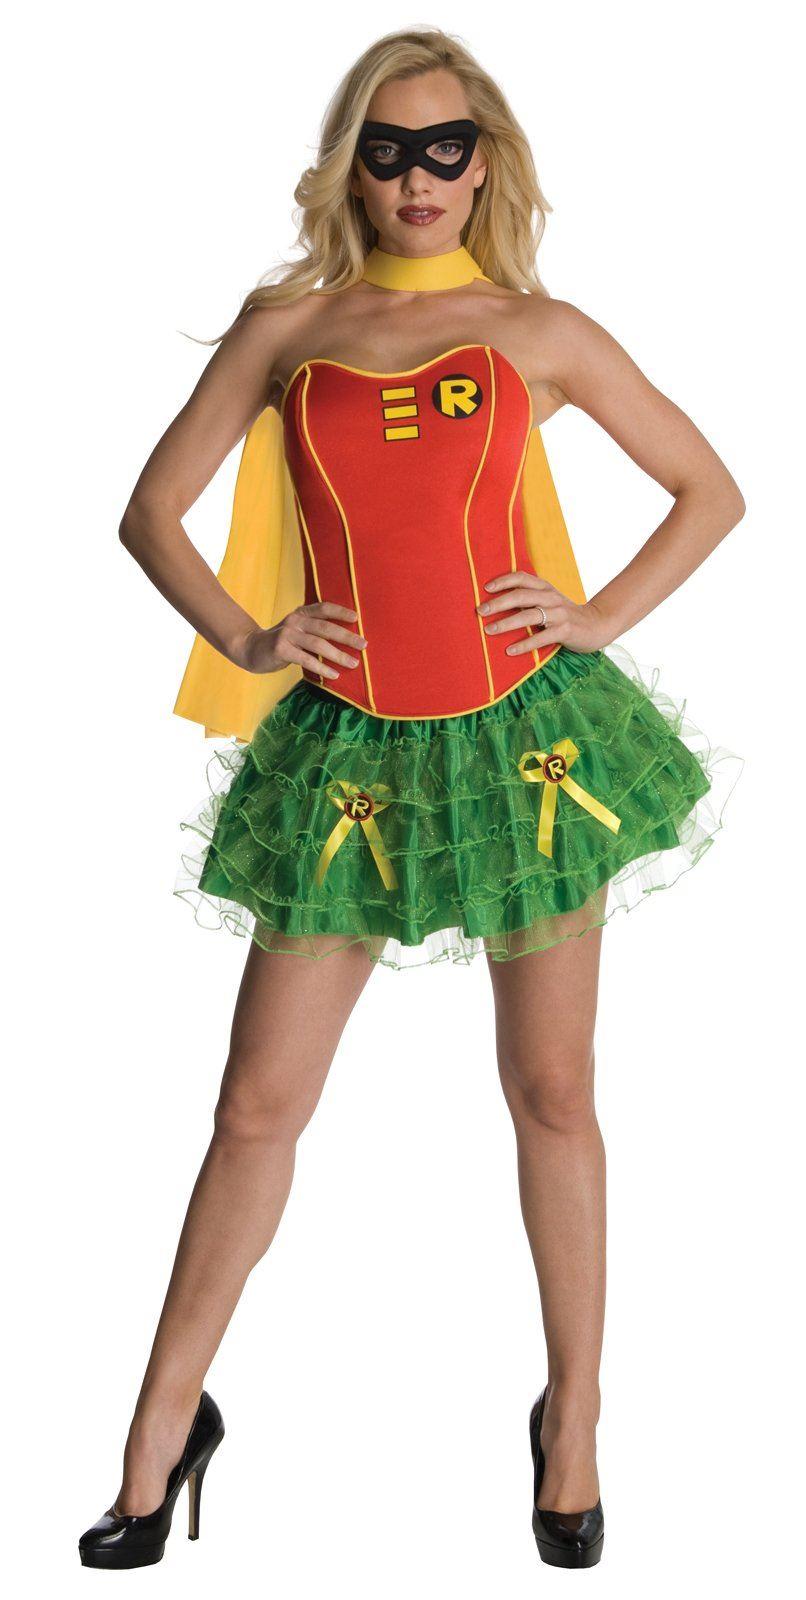 Adult Robin Justice League Woman Costume  sc 1 st  The Costume Land & Adult Robin Justice League Woman Costume | $47.99 | The Costume Land